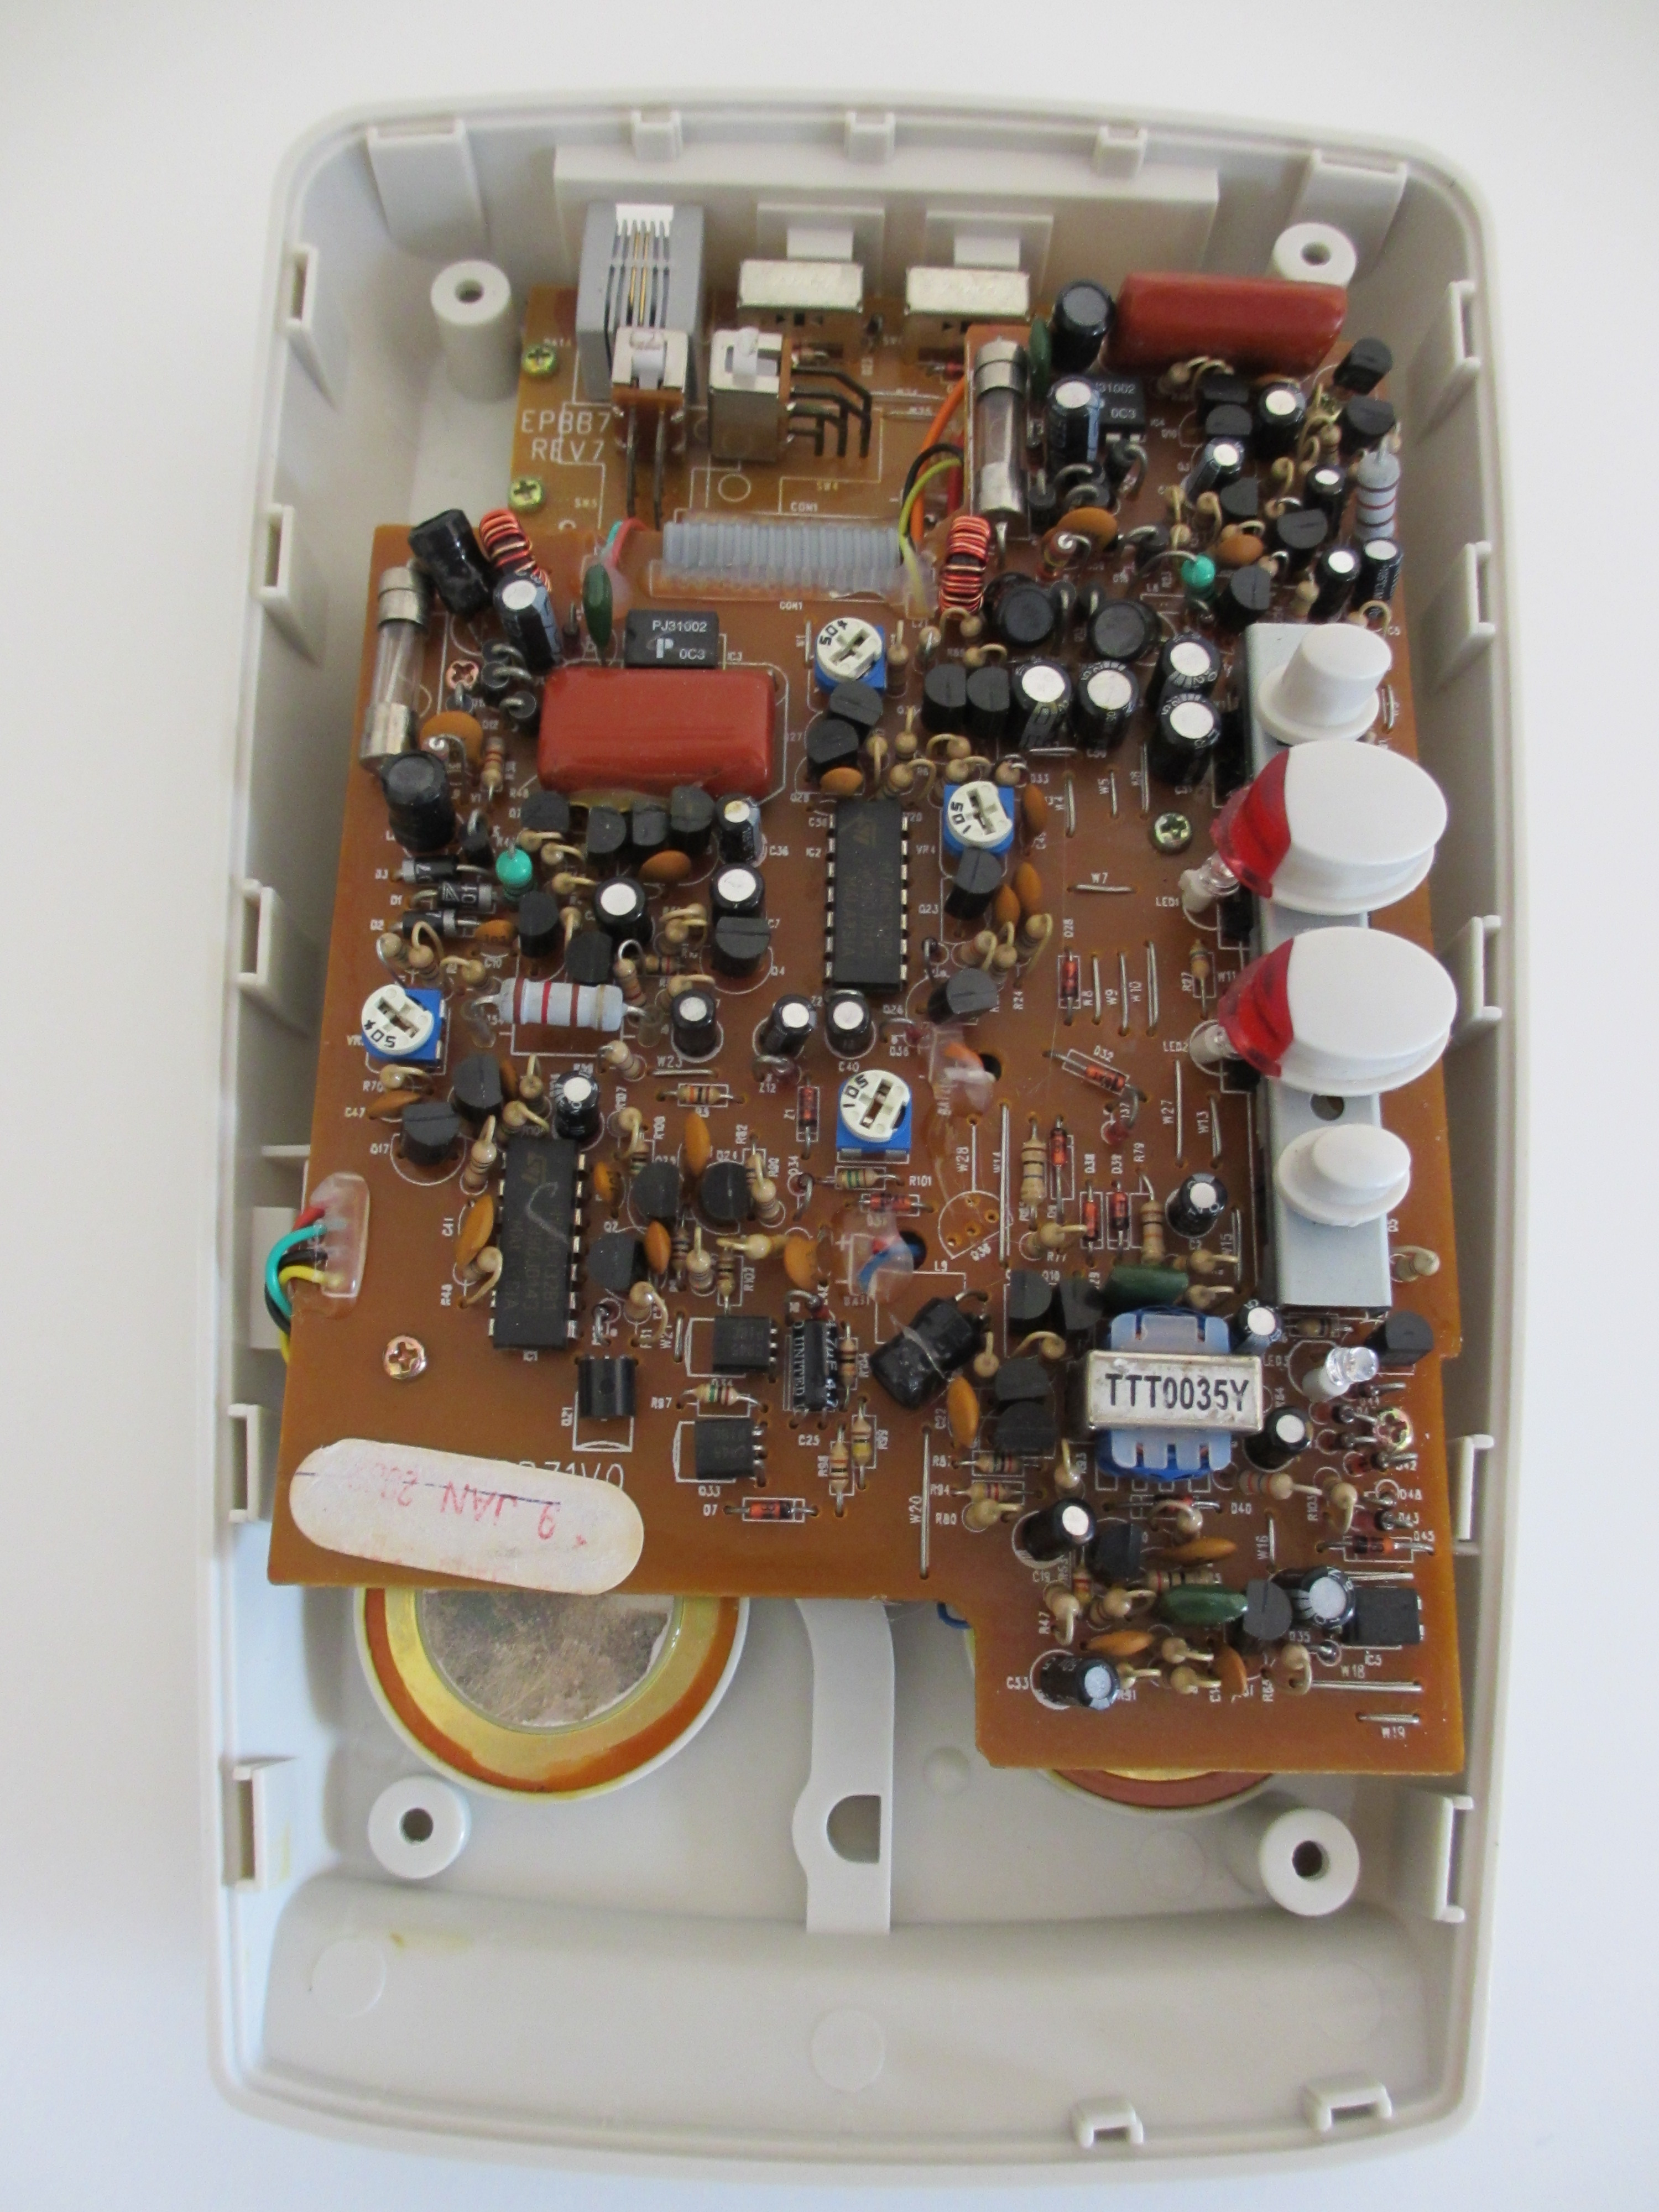 Inside a landline phone